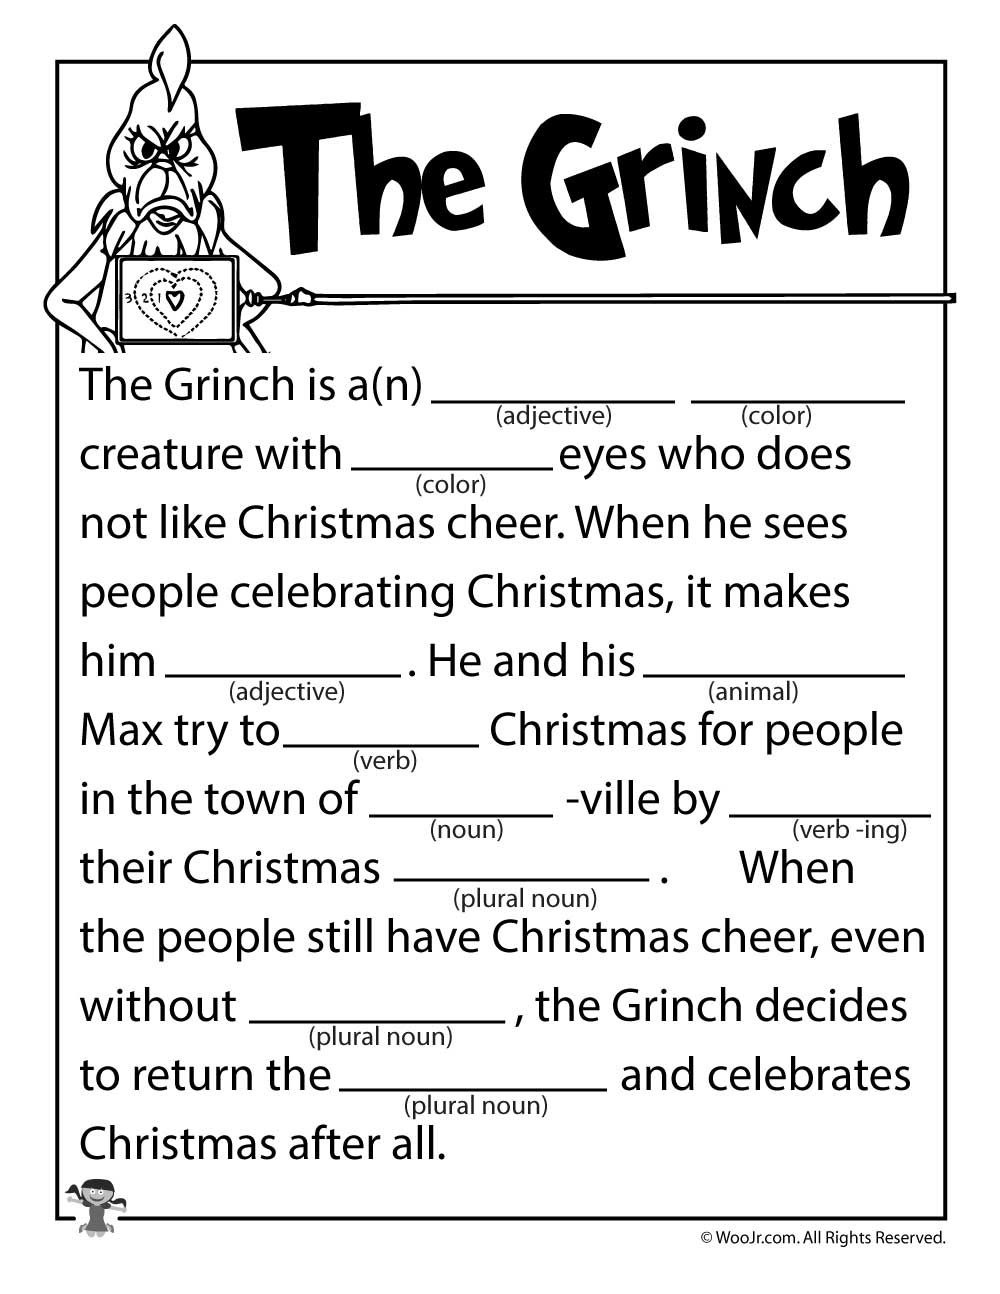 The Grinch Mad Lib | Holiday (C/g&a): Christmas Games/activities - Christmas Mad Libs Printable Free